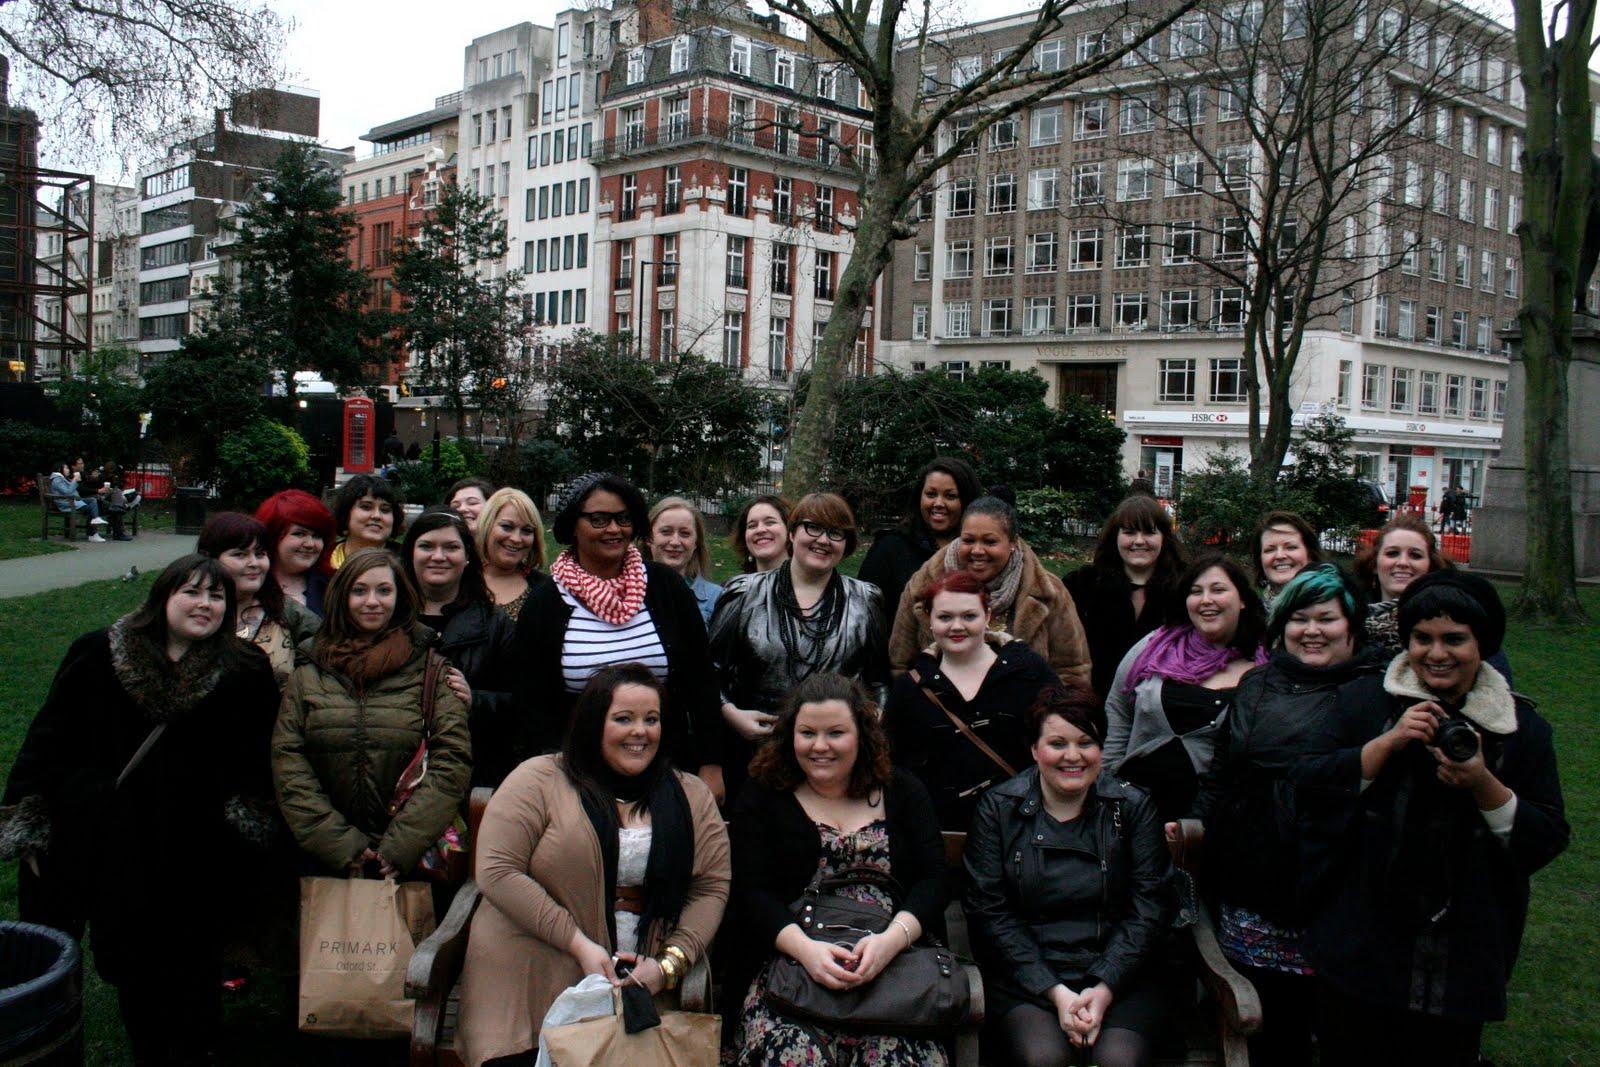 Plus Size Fashion Bloggers at LondonPlus - Daytime